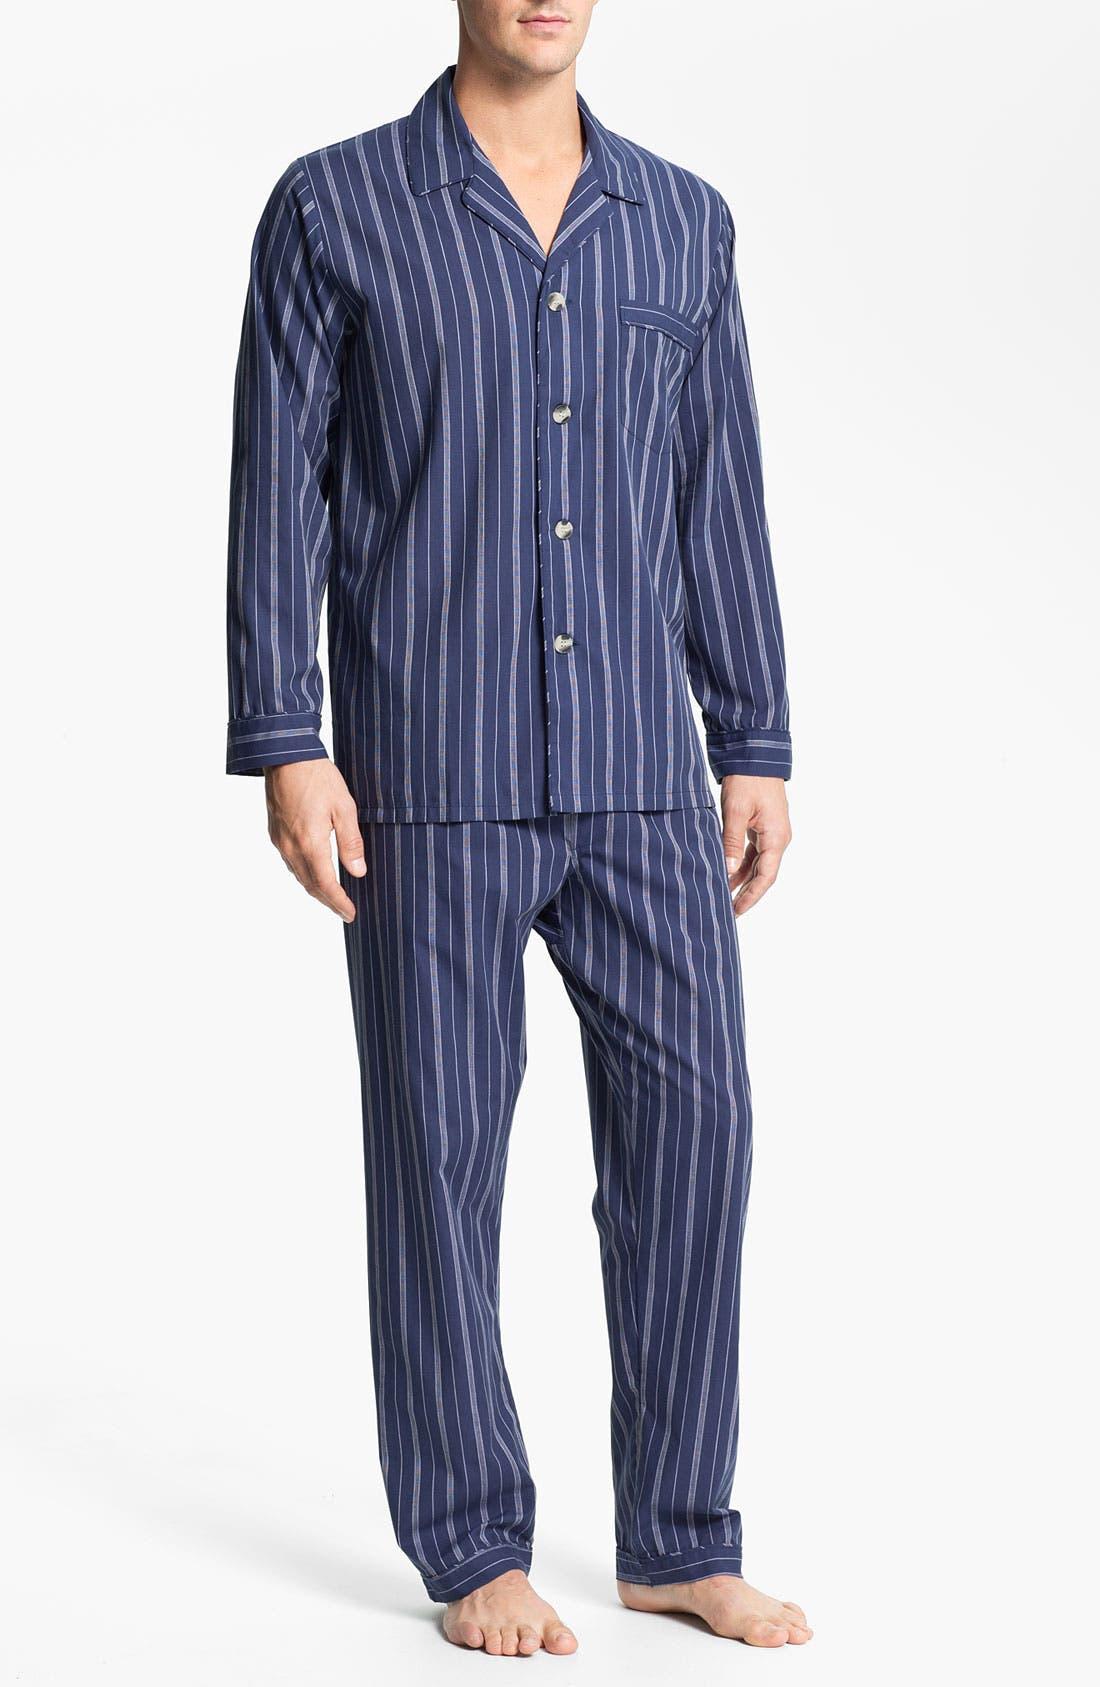 Main Image - Majestic International Stripe Easy Care Pajama Set (Big & Tall)